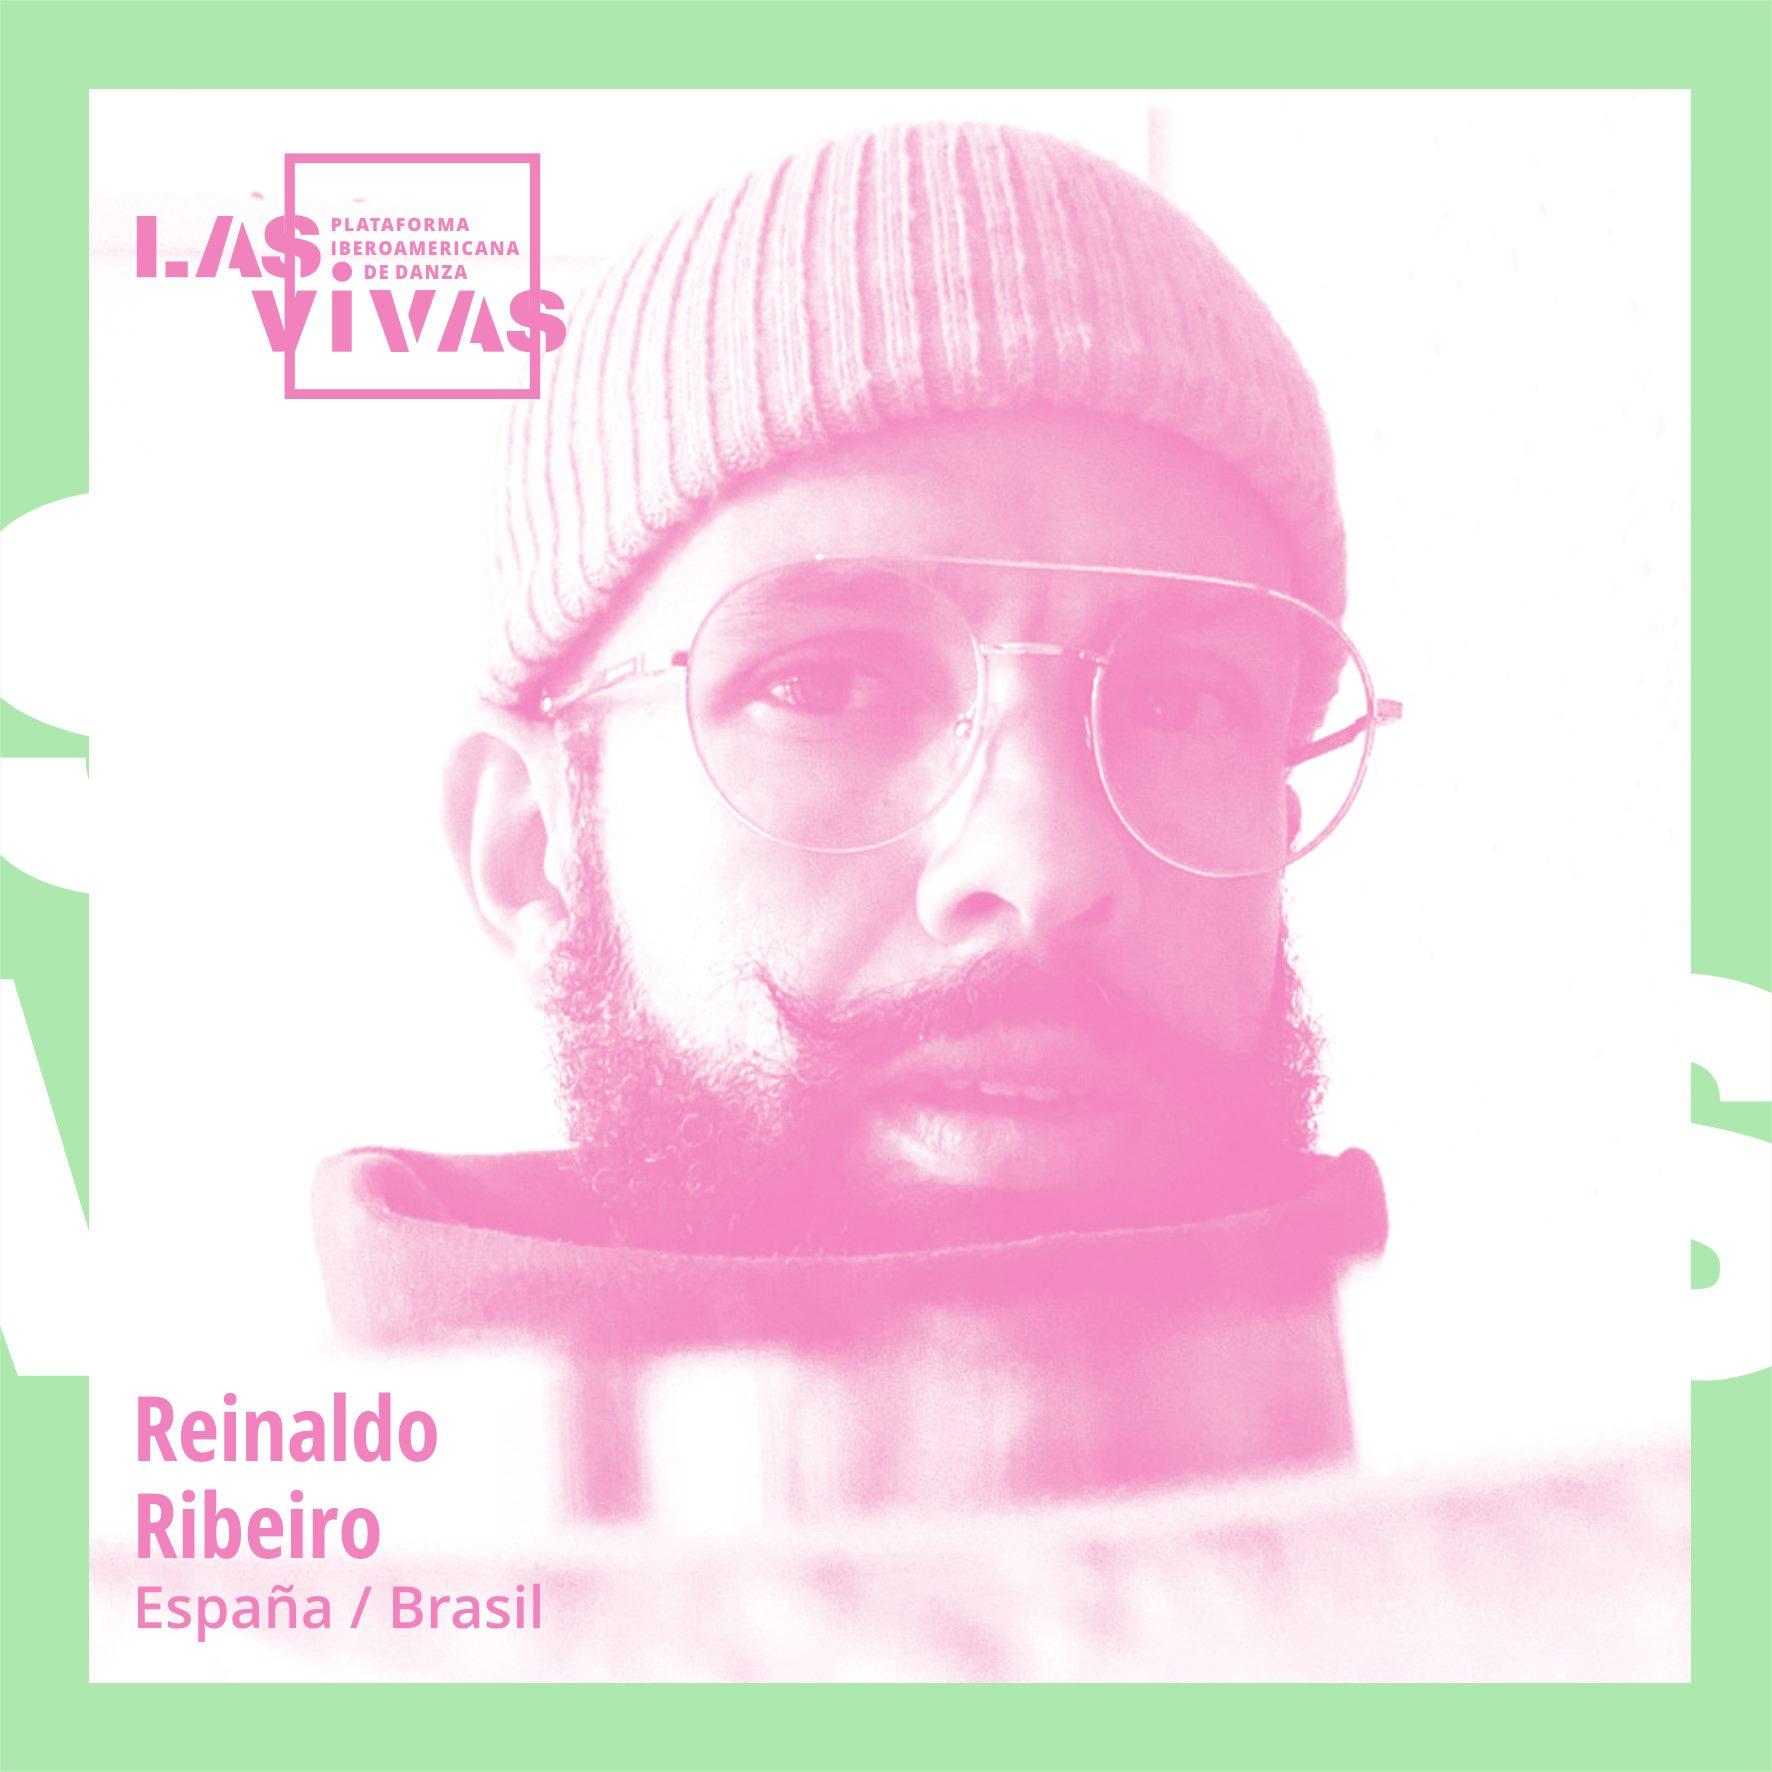 Reinaldo Ribeiro